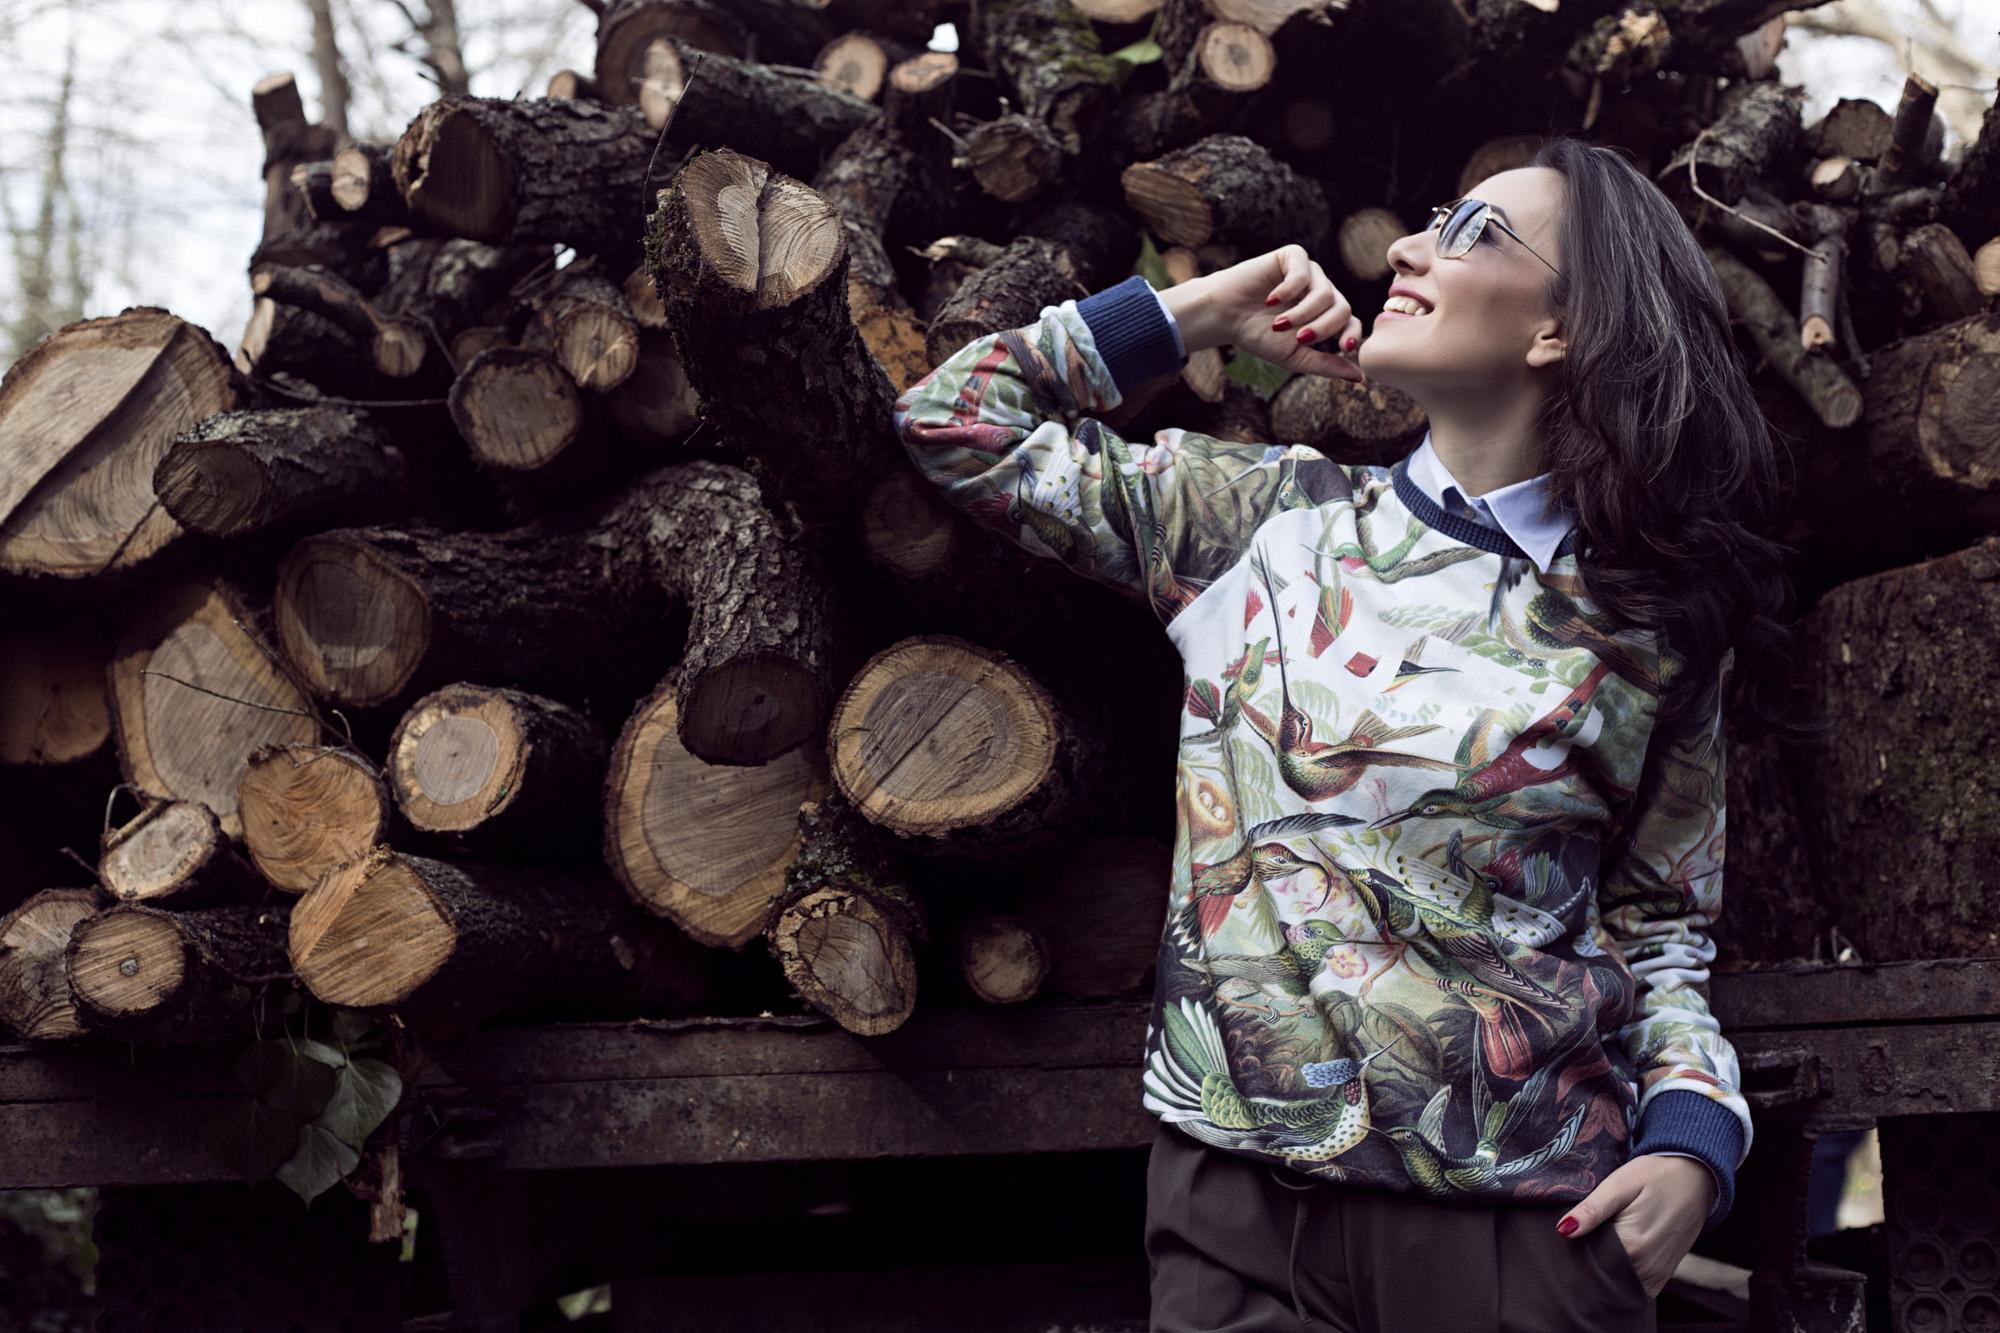 woods boho vesper sweatshirt tom ford gozluk